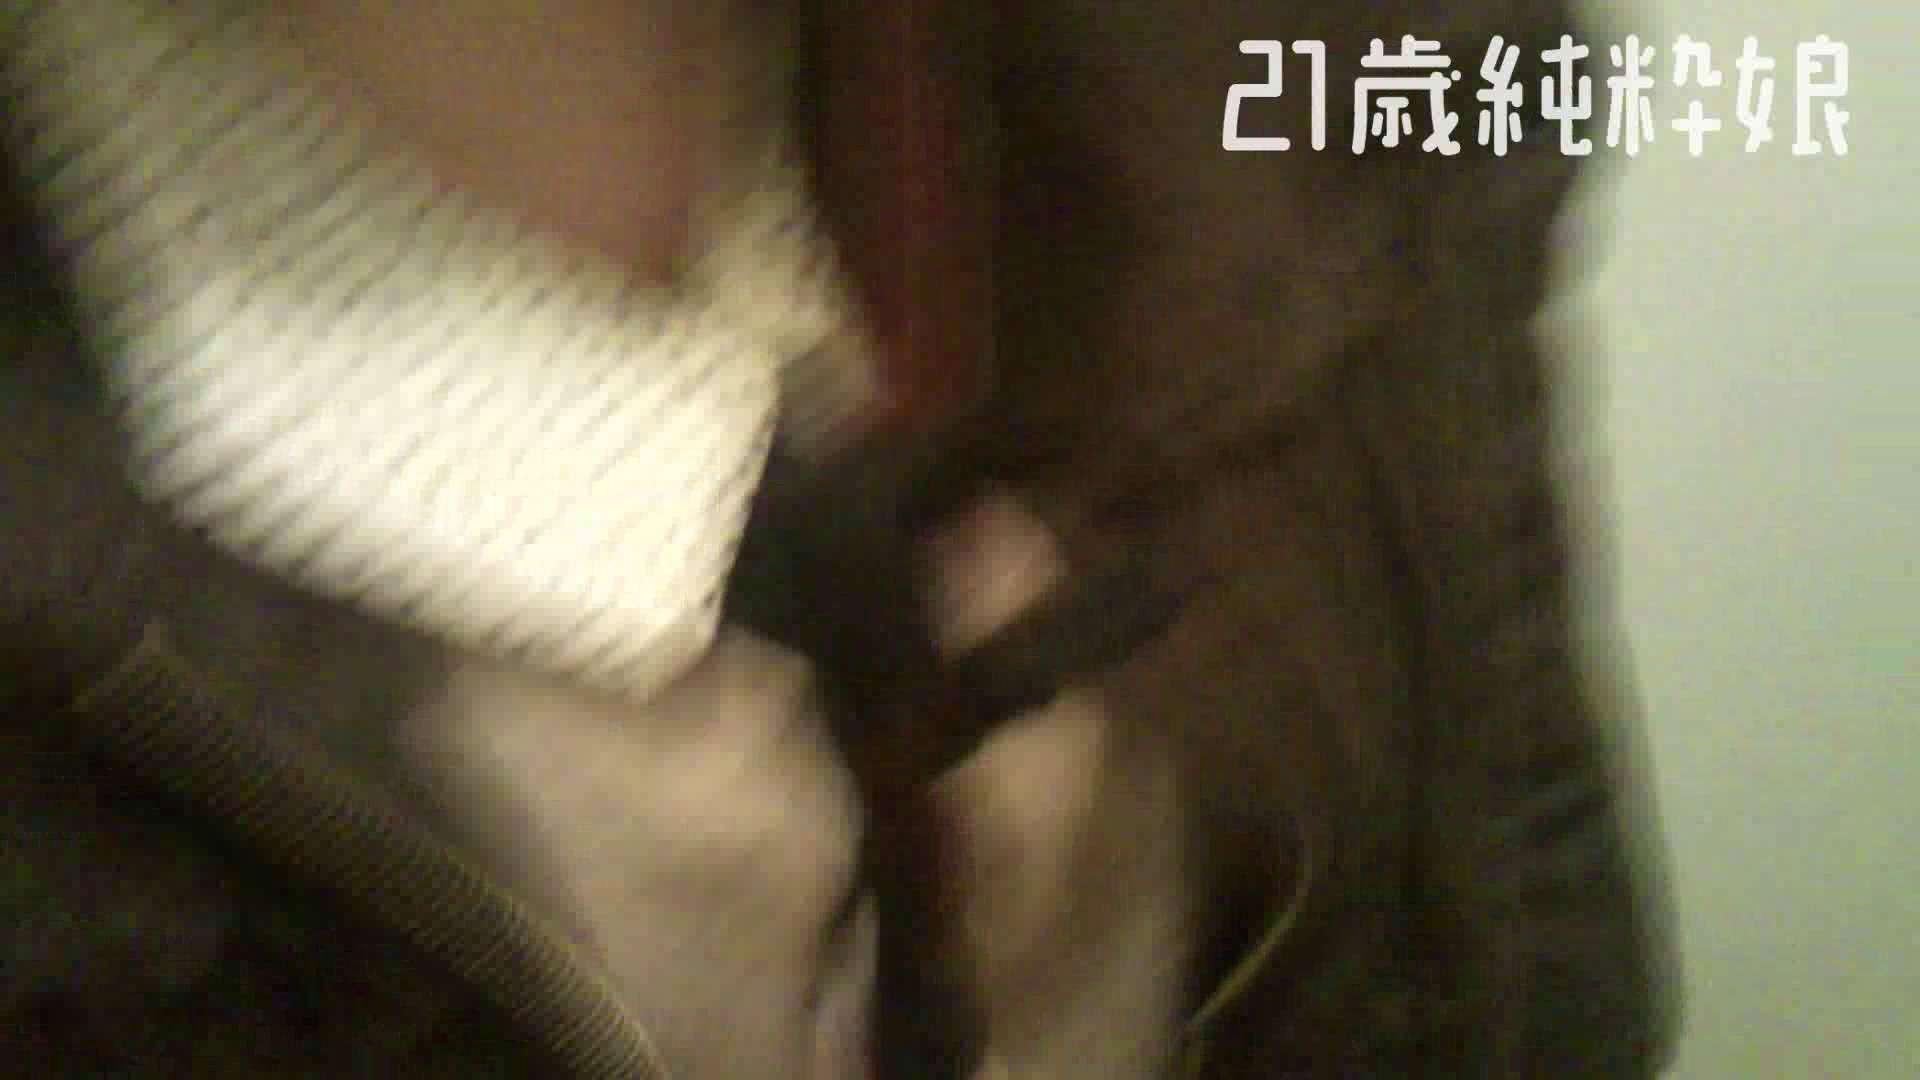 Gカップ21歳純粋嬢第2弾Vol.5 OLヌード天国 | 学校  110PIX 83